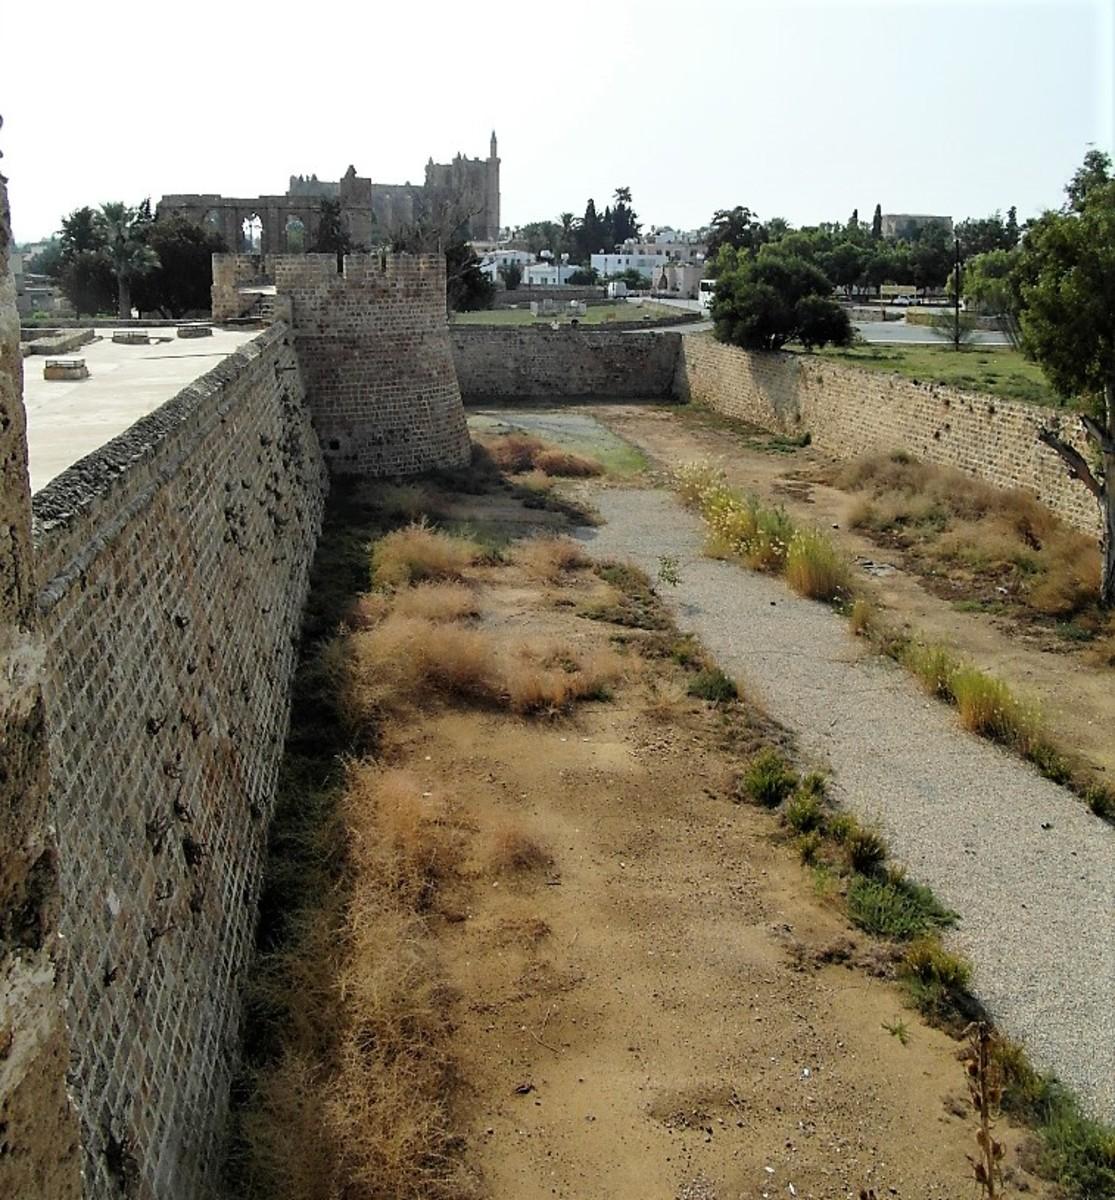 The castle walls.